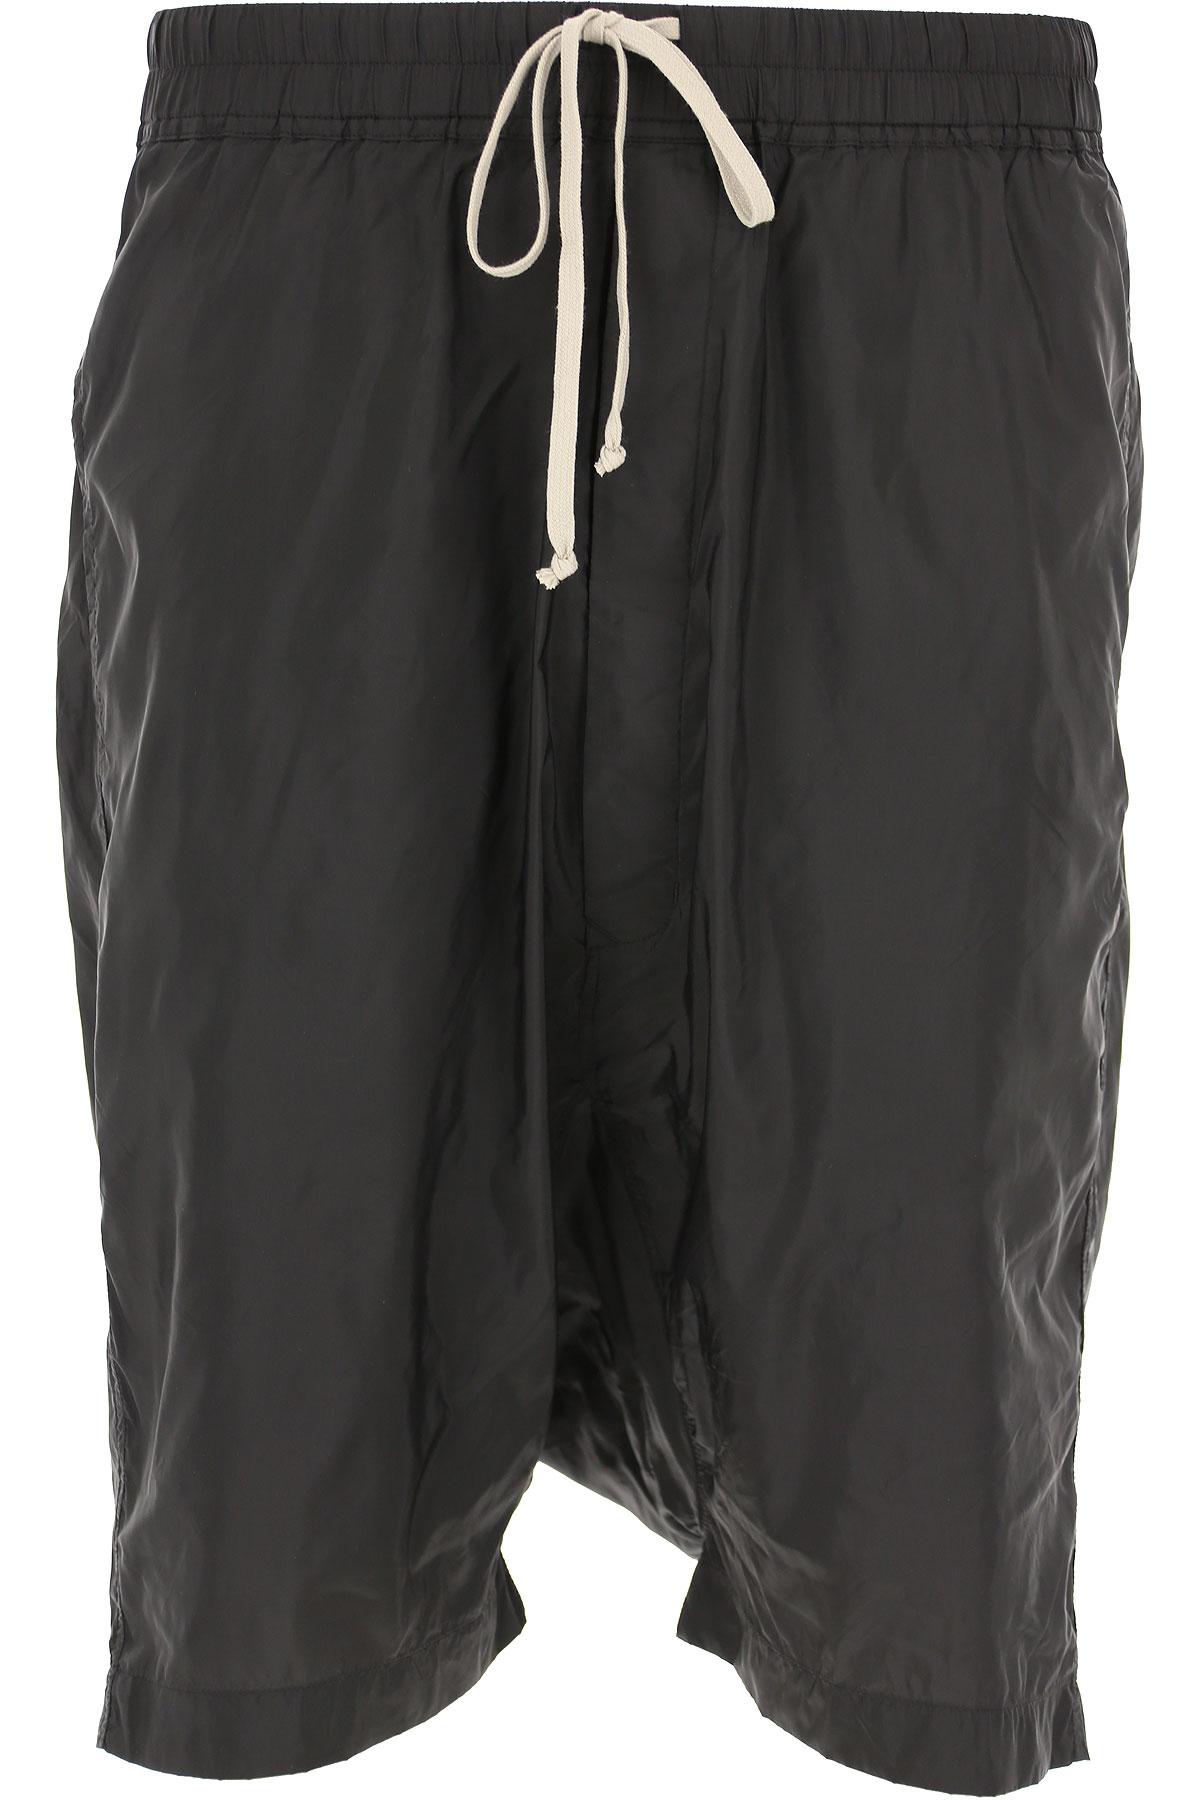 Rick Owens DRKSHDW Mens Clothing On Sale in Outlet, Black, poliammide, 2019, S